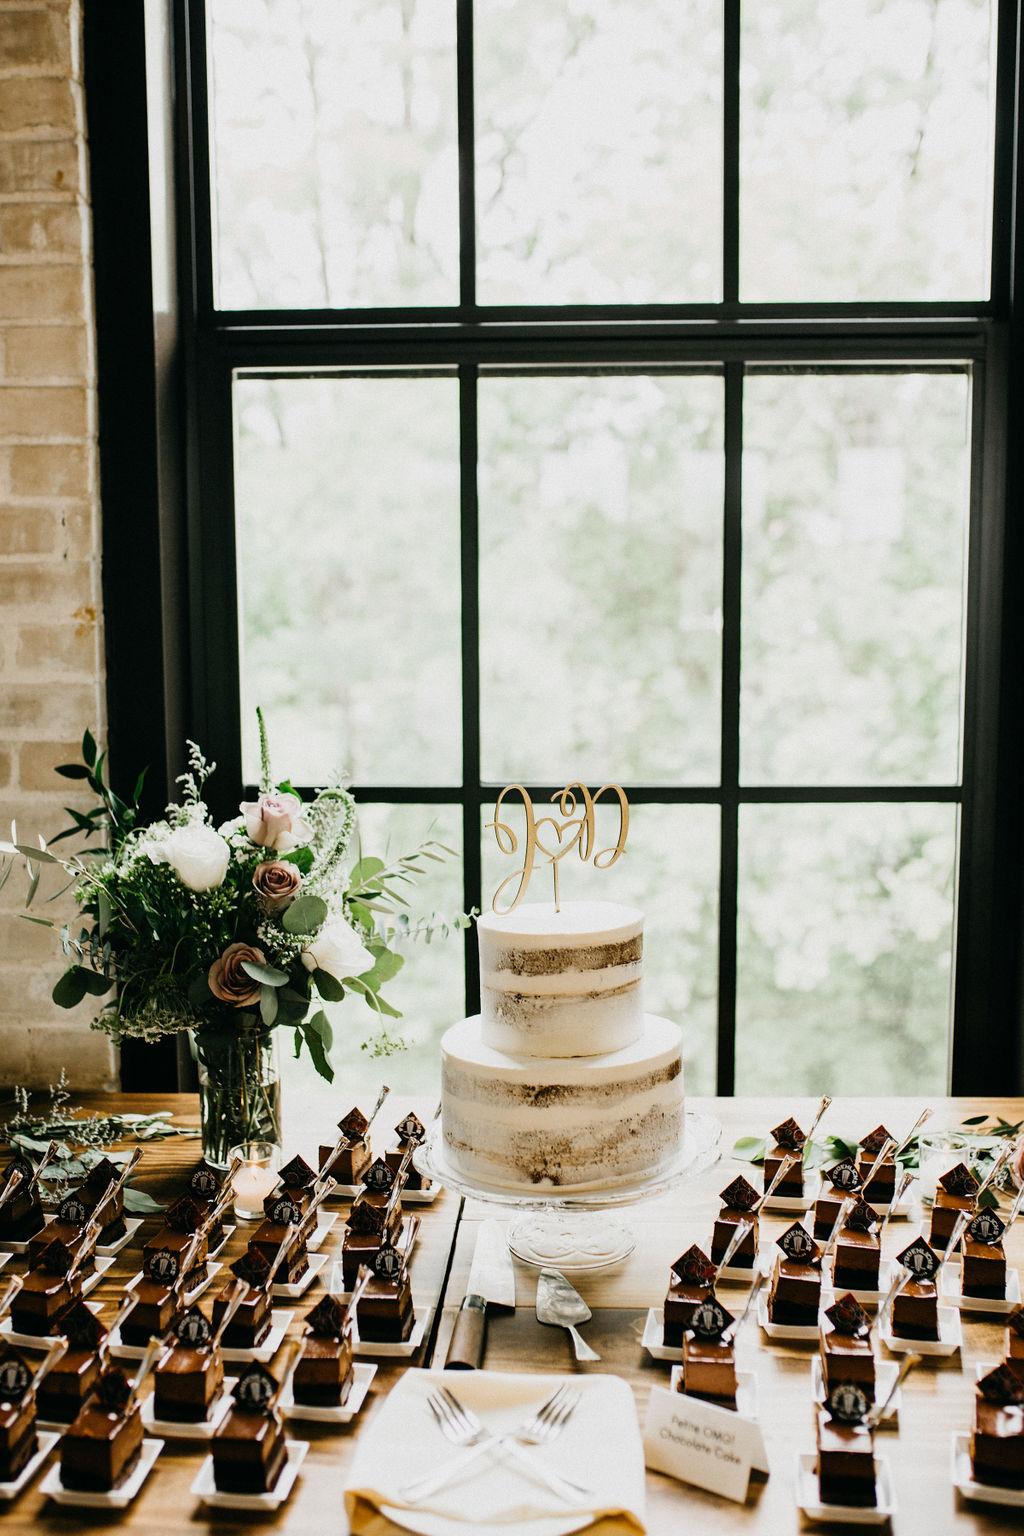 A wedding cake and desserts